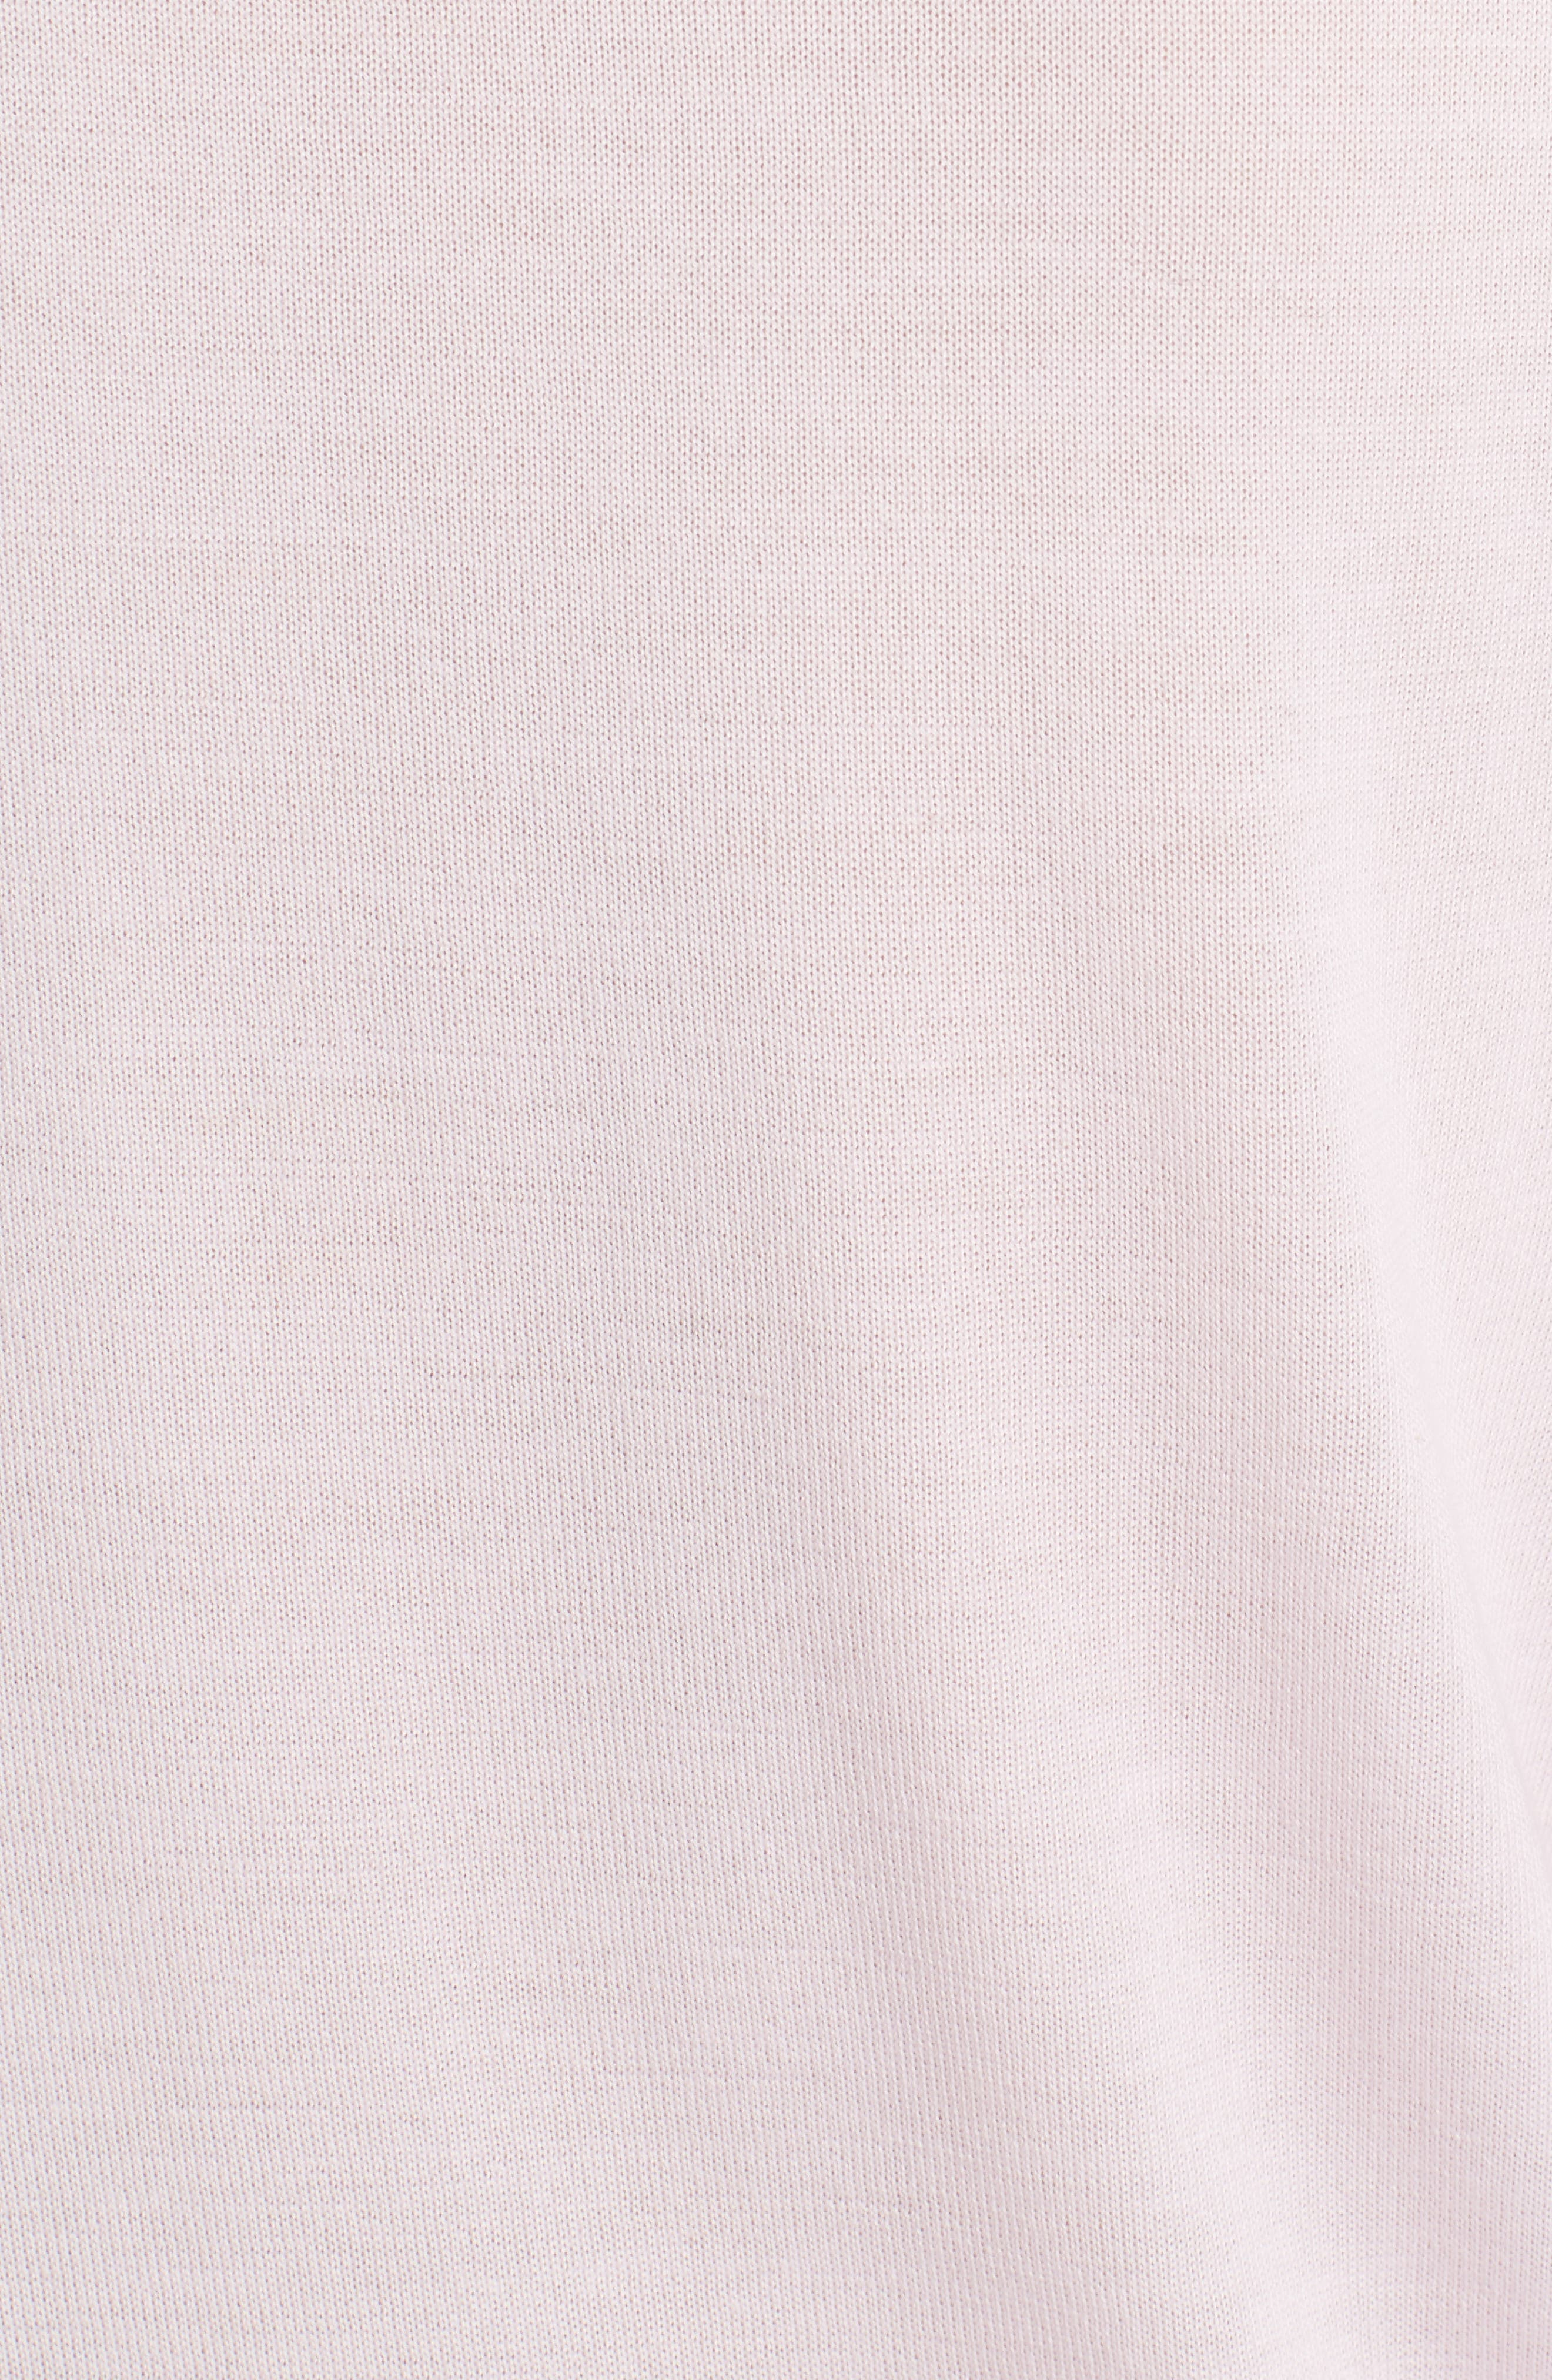 Cashmere Sweater,                             Alternate thumbnail 5, color,                             680